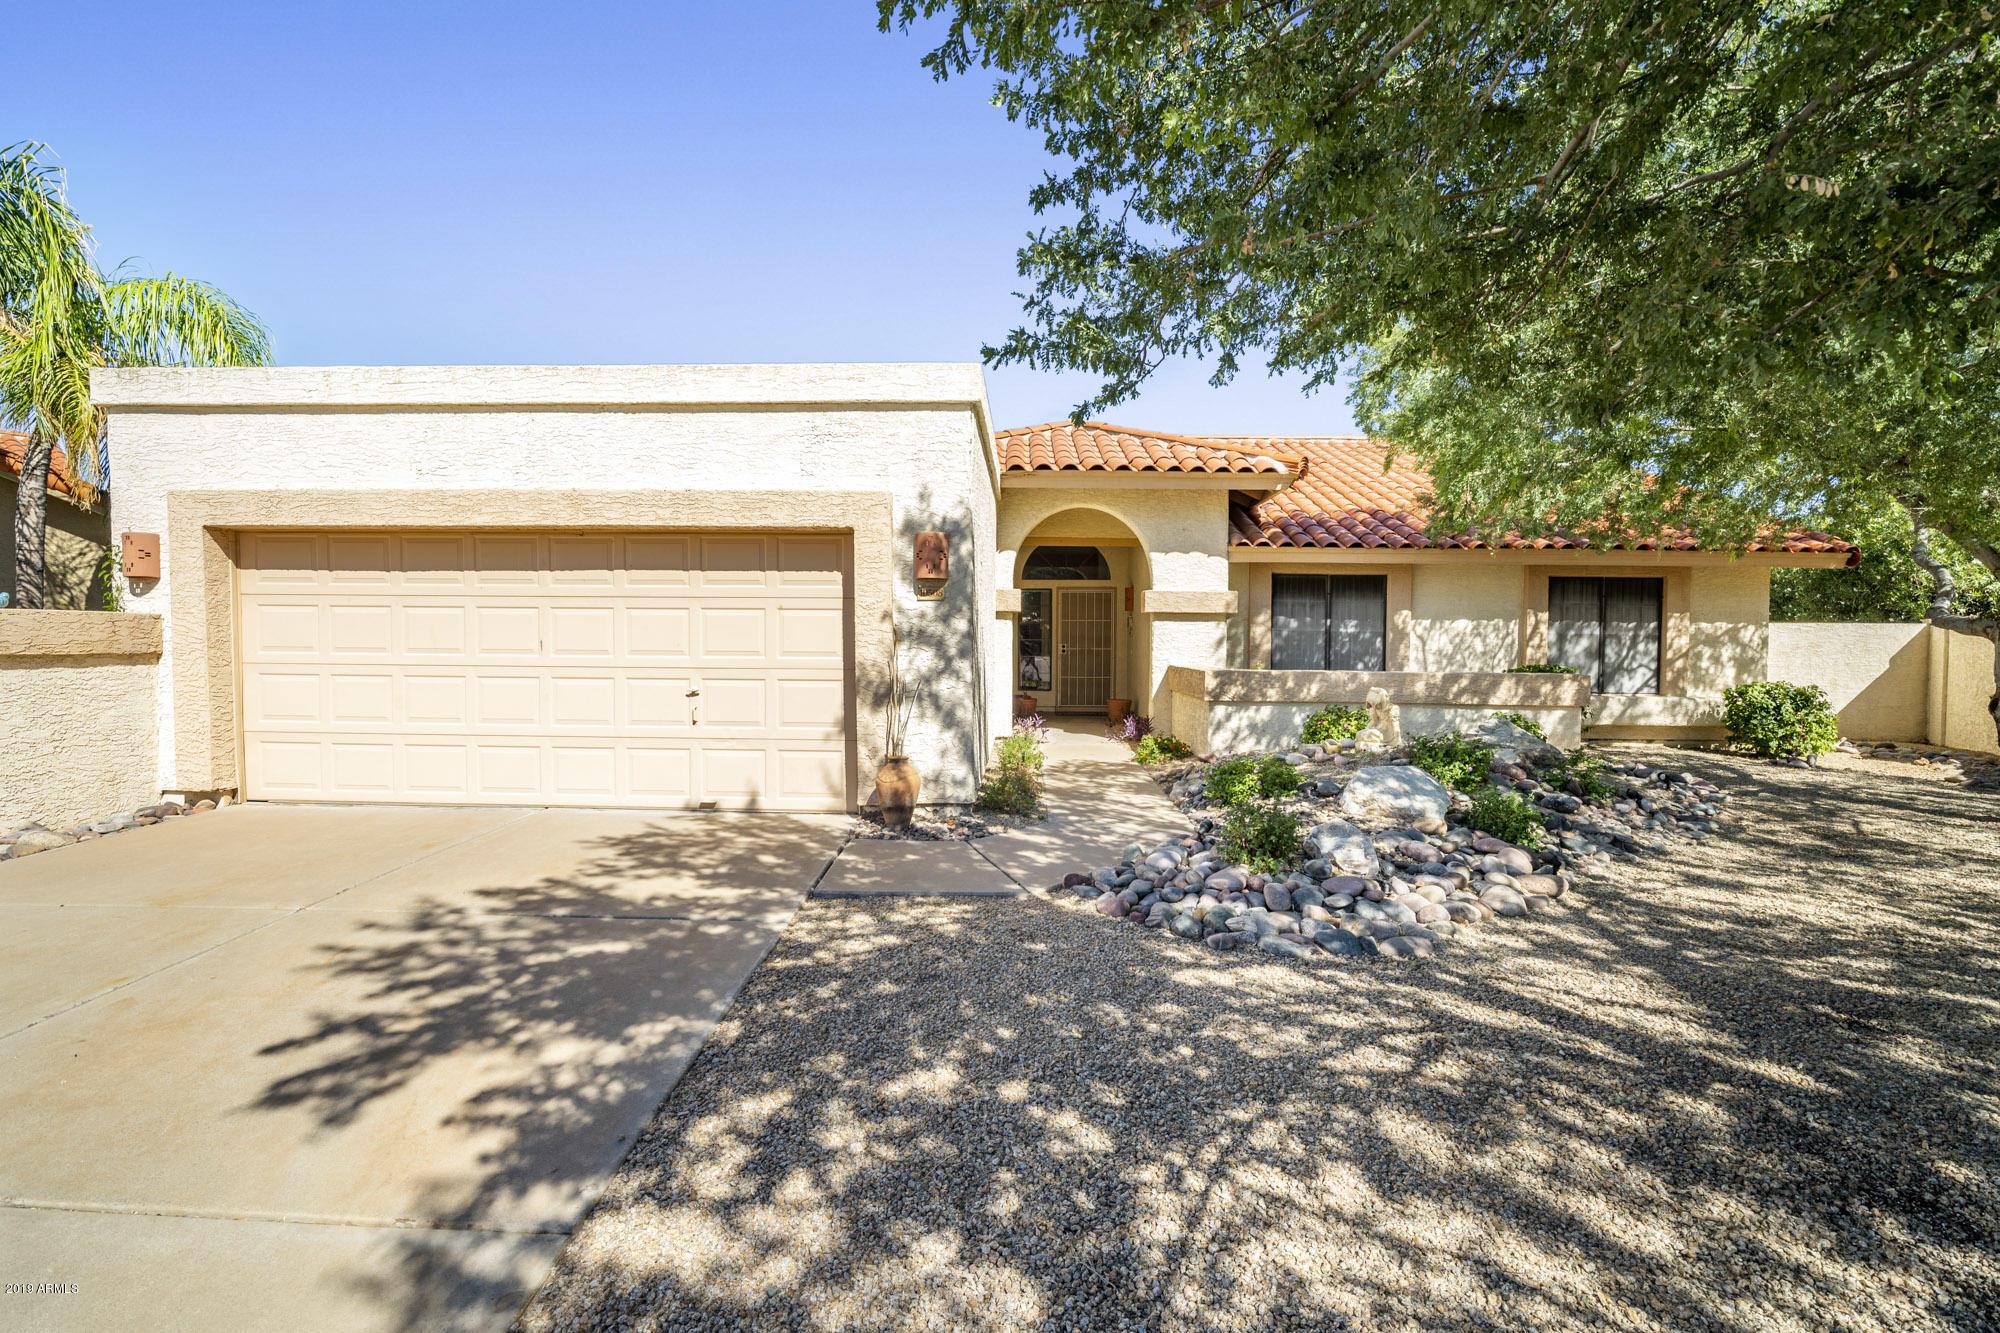 Photo of 10508 E Mission Lane, Scottsdale, AZ 85258